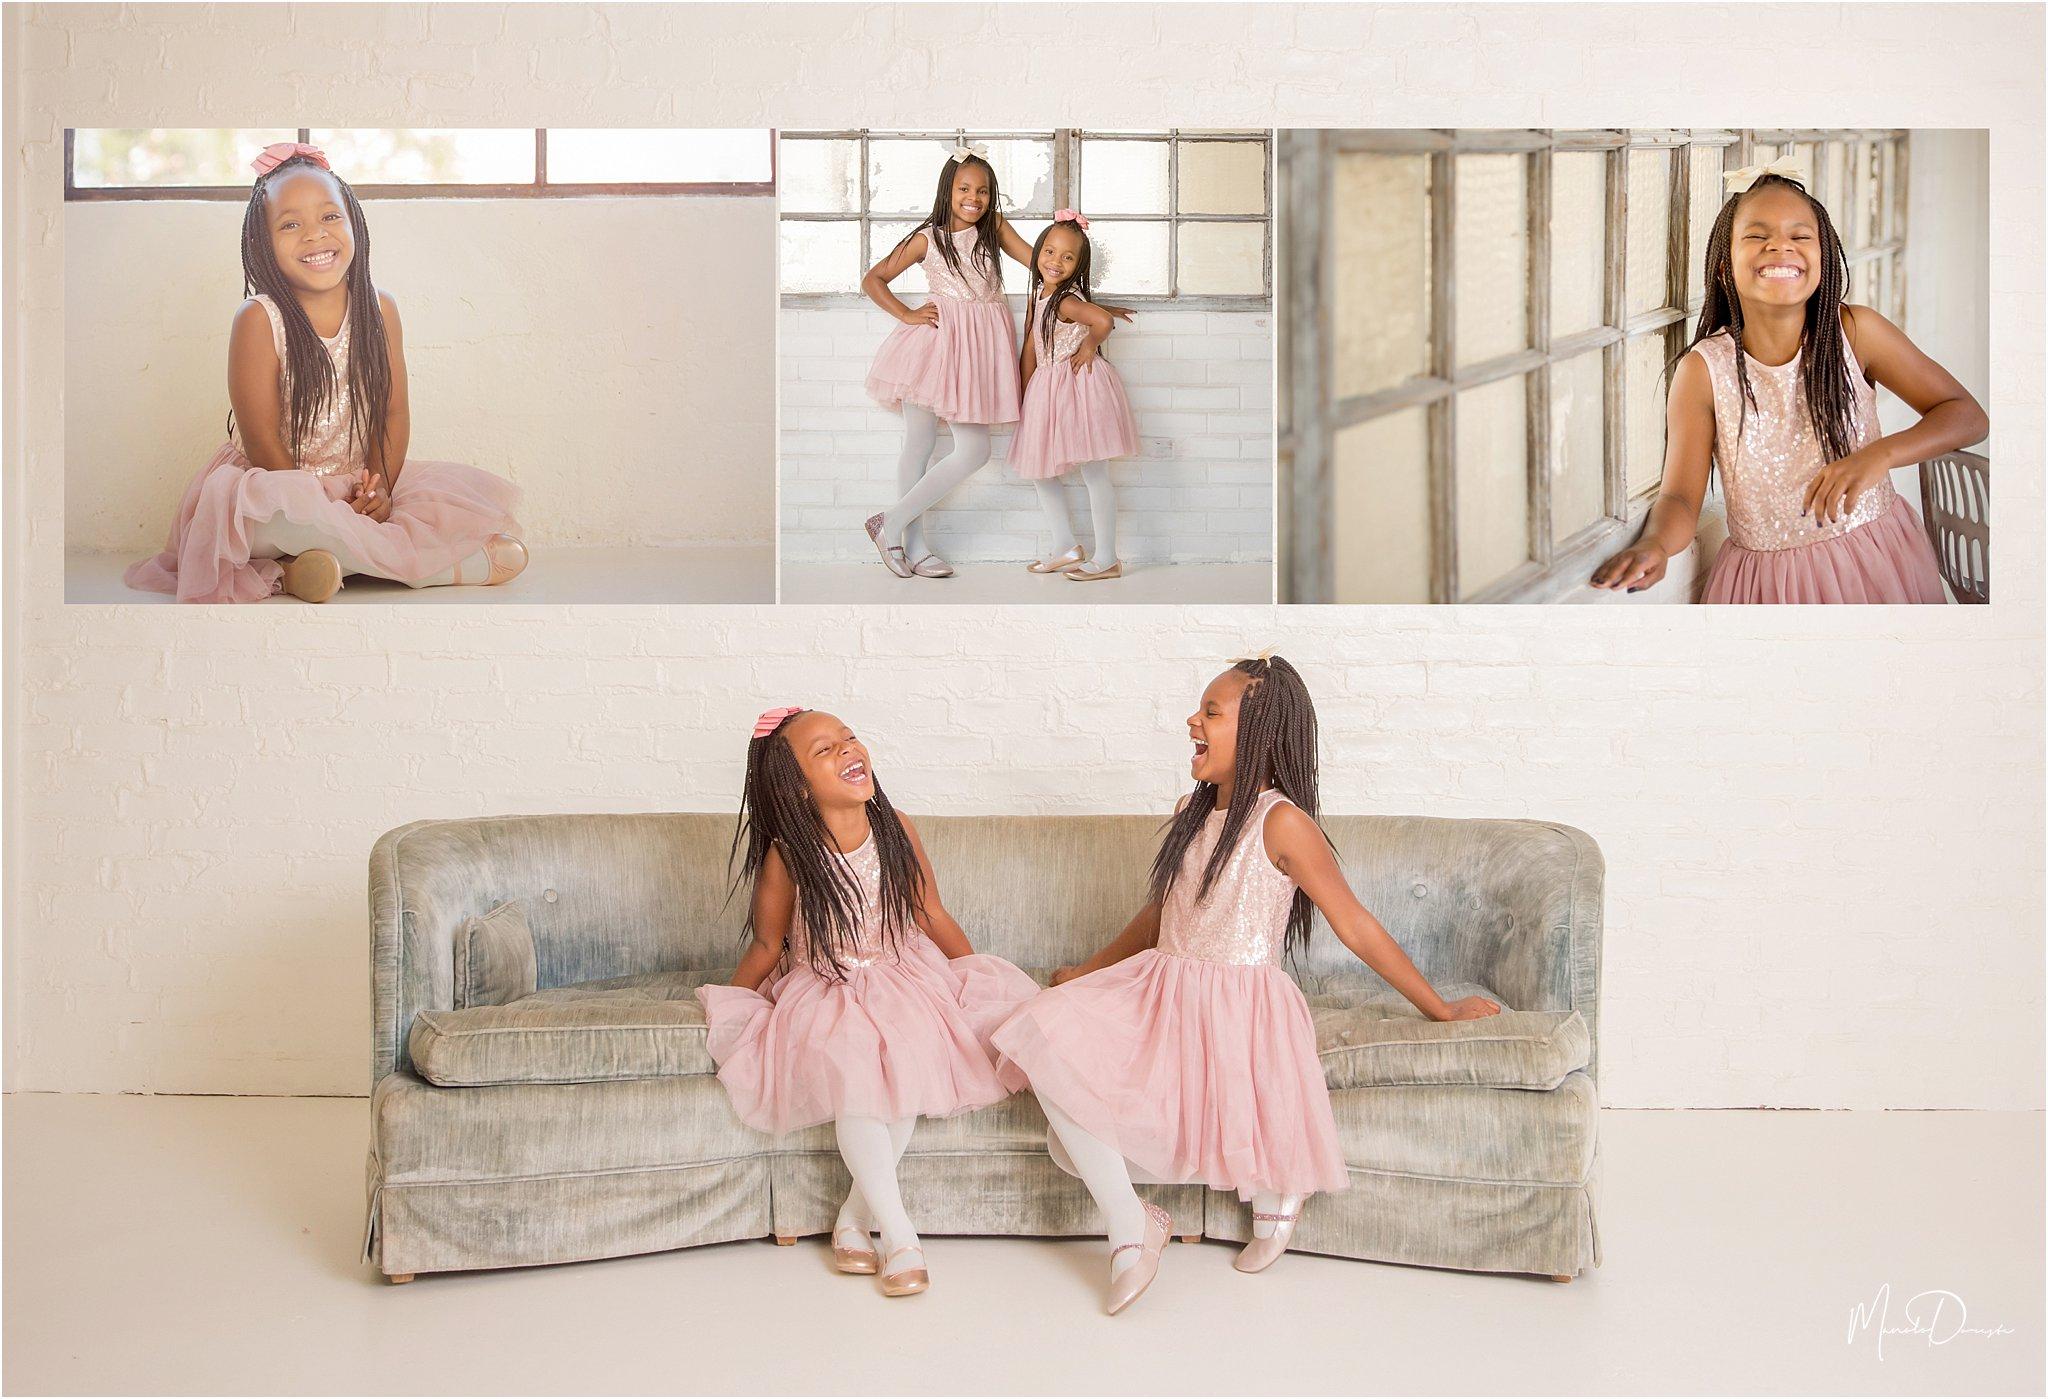 01008_ManoloDoreste_InFocusStudios_Wedding_Family_Photography_Miami_MiamiPhotographer.jpg